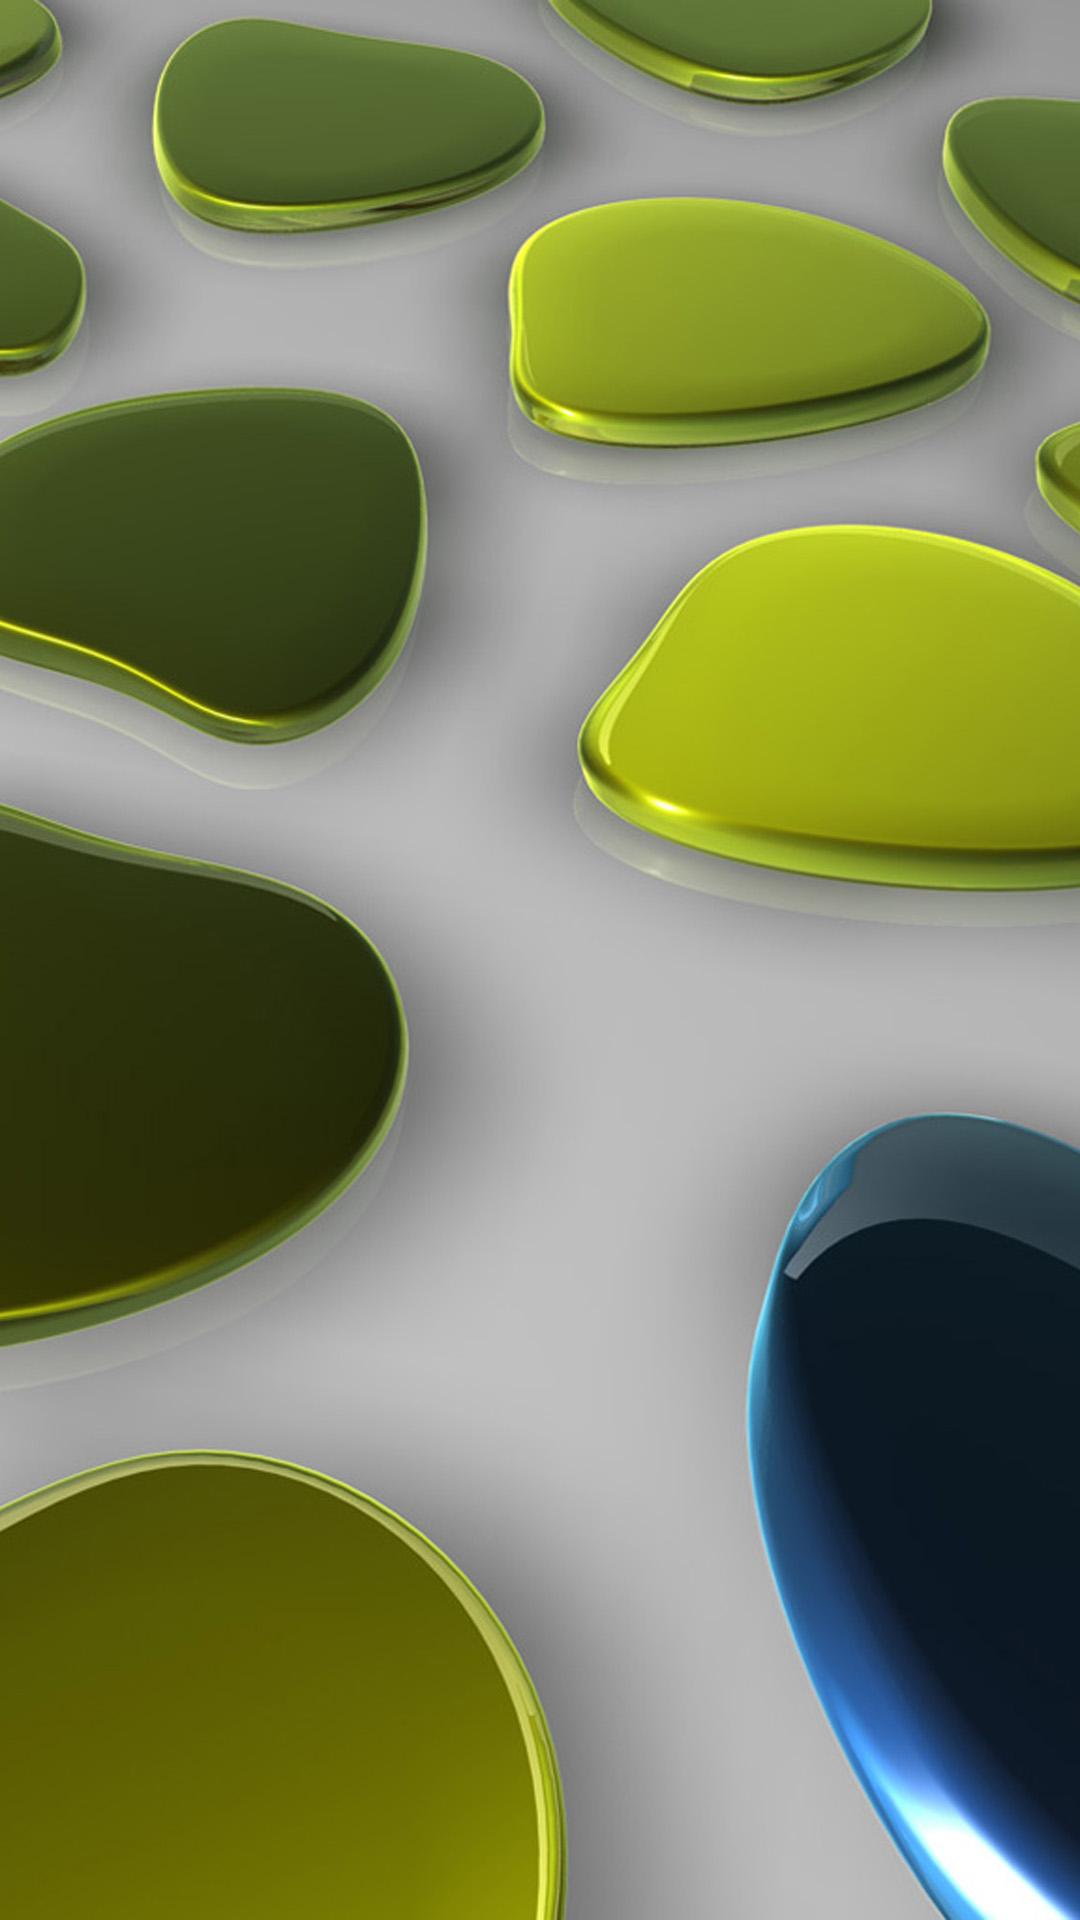 Hd wallpaper samsung - New Wallpapers Hd Samsung Galaxy S5 Wallpapers Samsung Galaxy S5